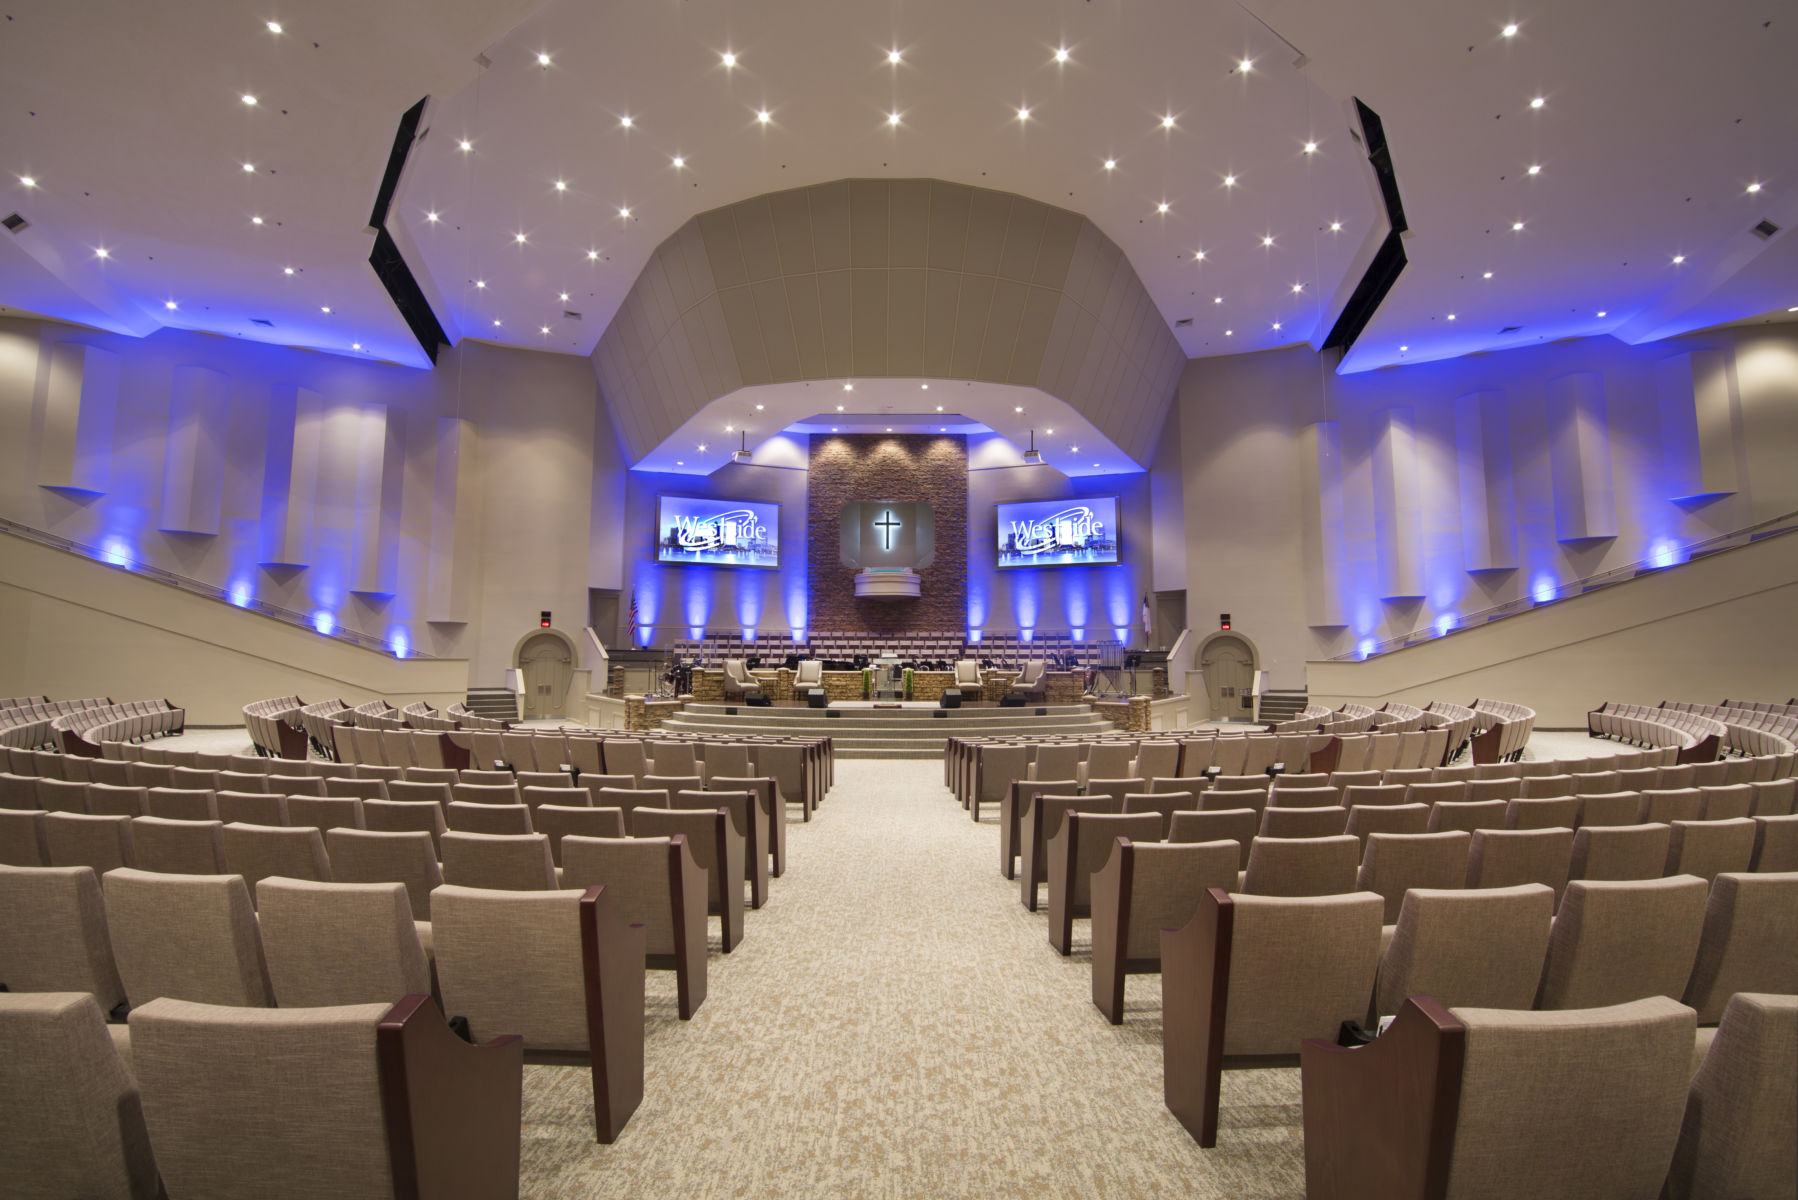 Westside Baptist Church - Church Interiors, Inc.